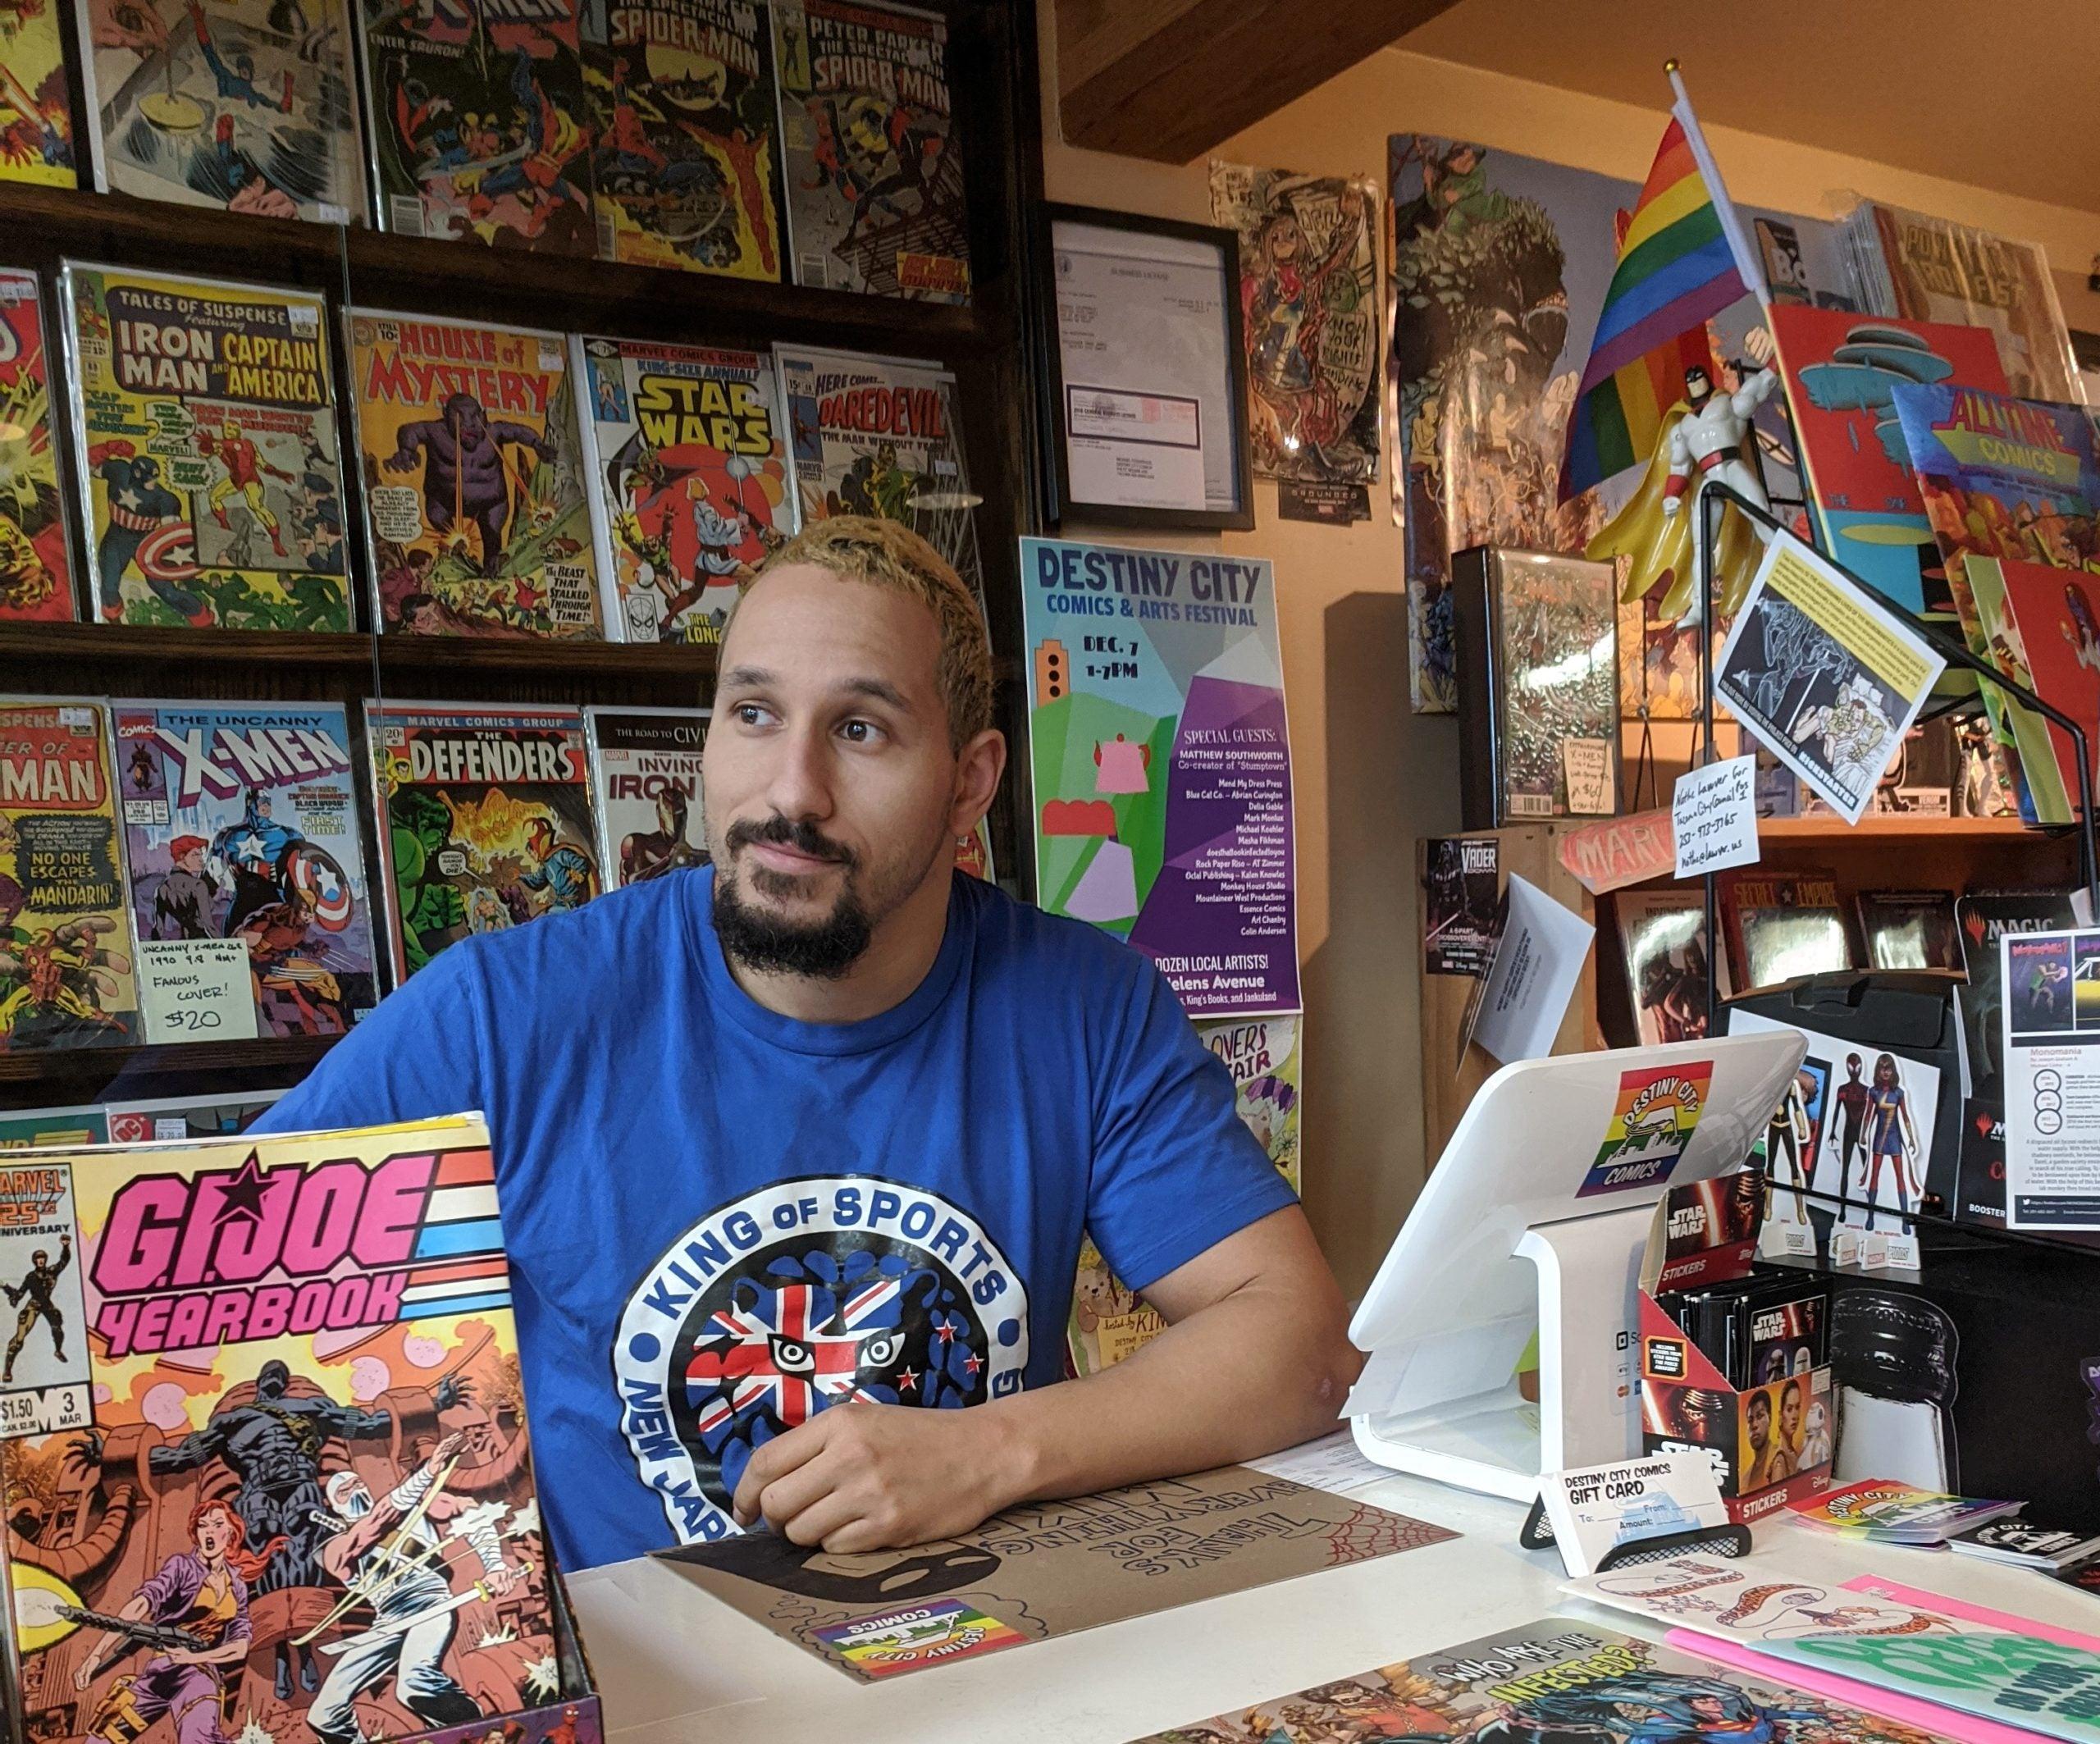 Ethan HD ready to help Destiny City Comics customers